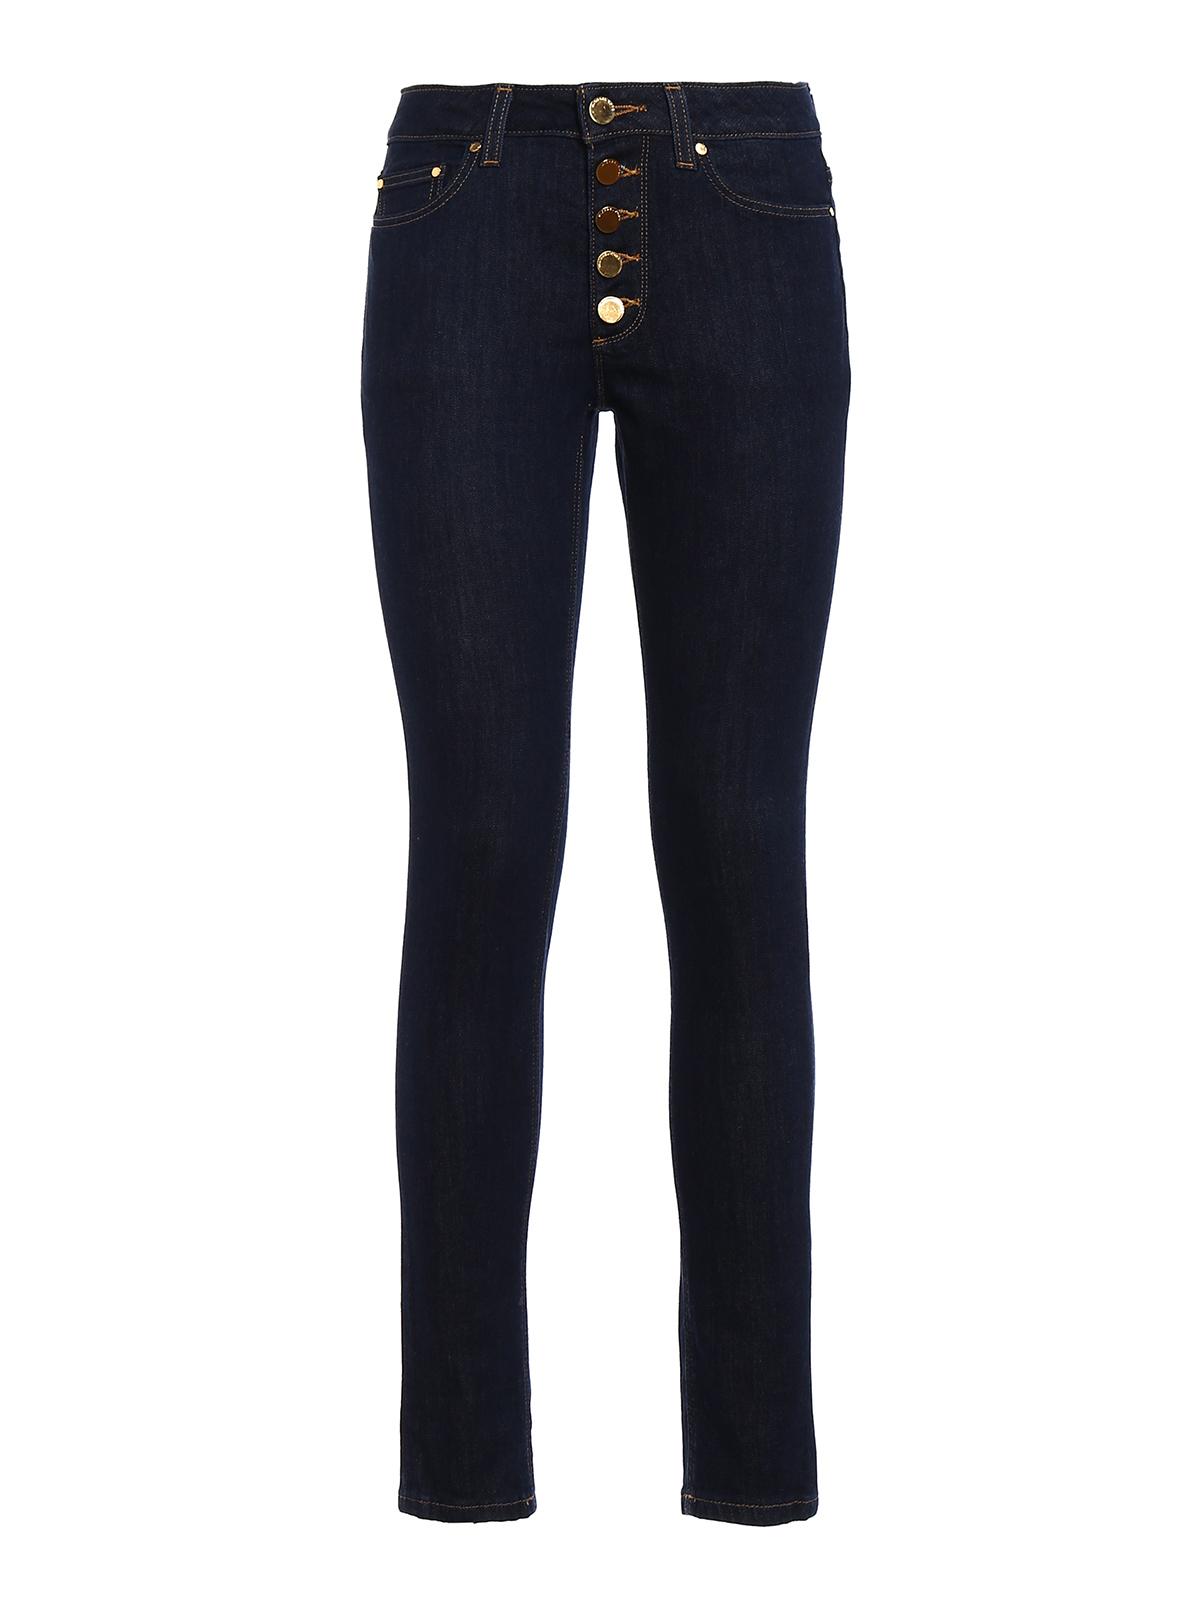 Michael Kors Gold Tone Button Slim Jeans Skinny Jeans